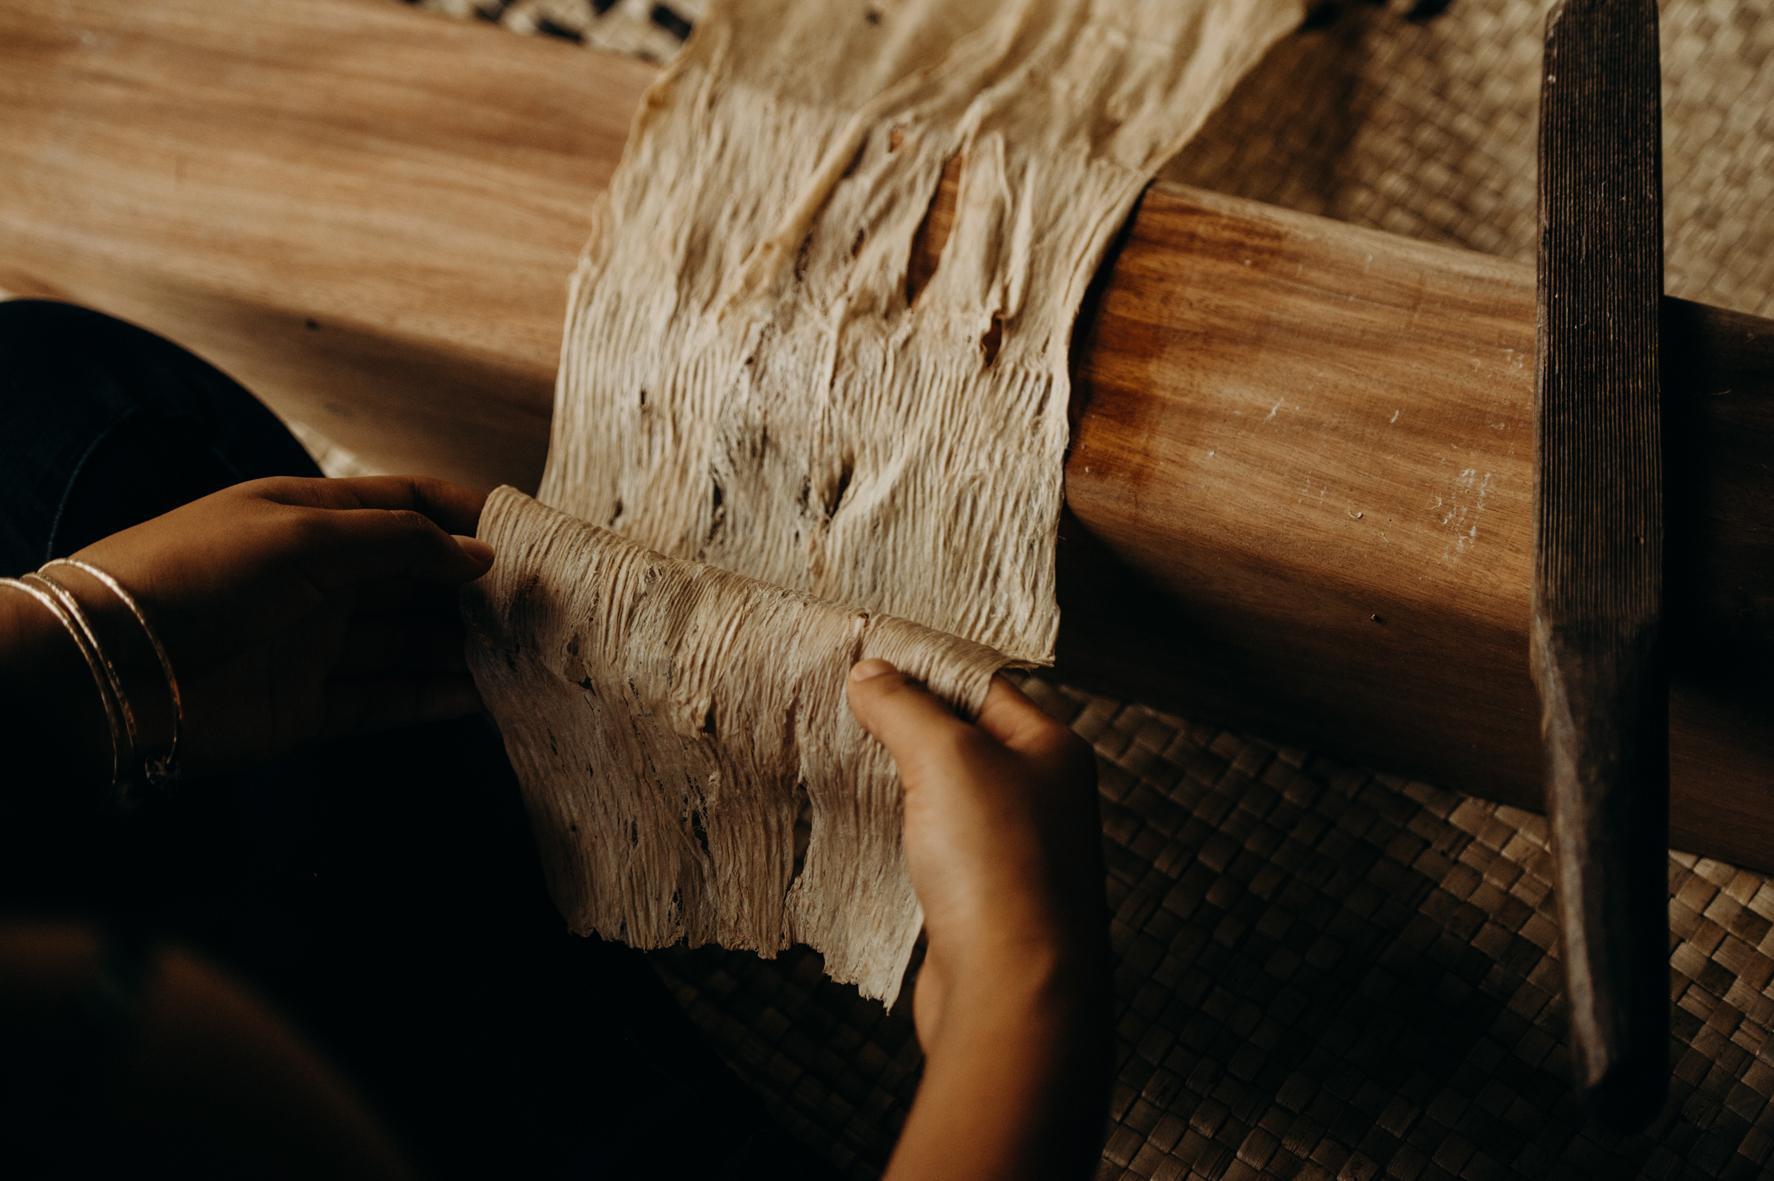 Maui artisan working